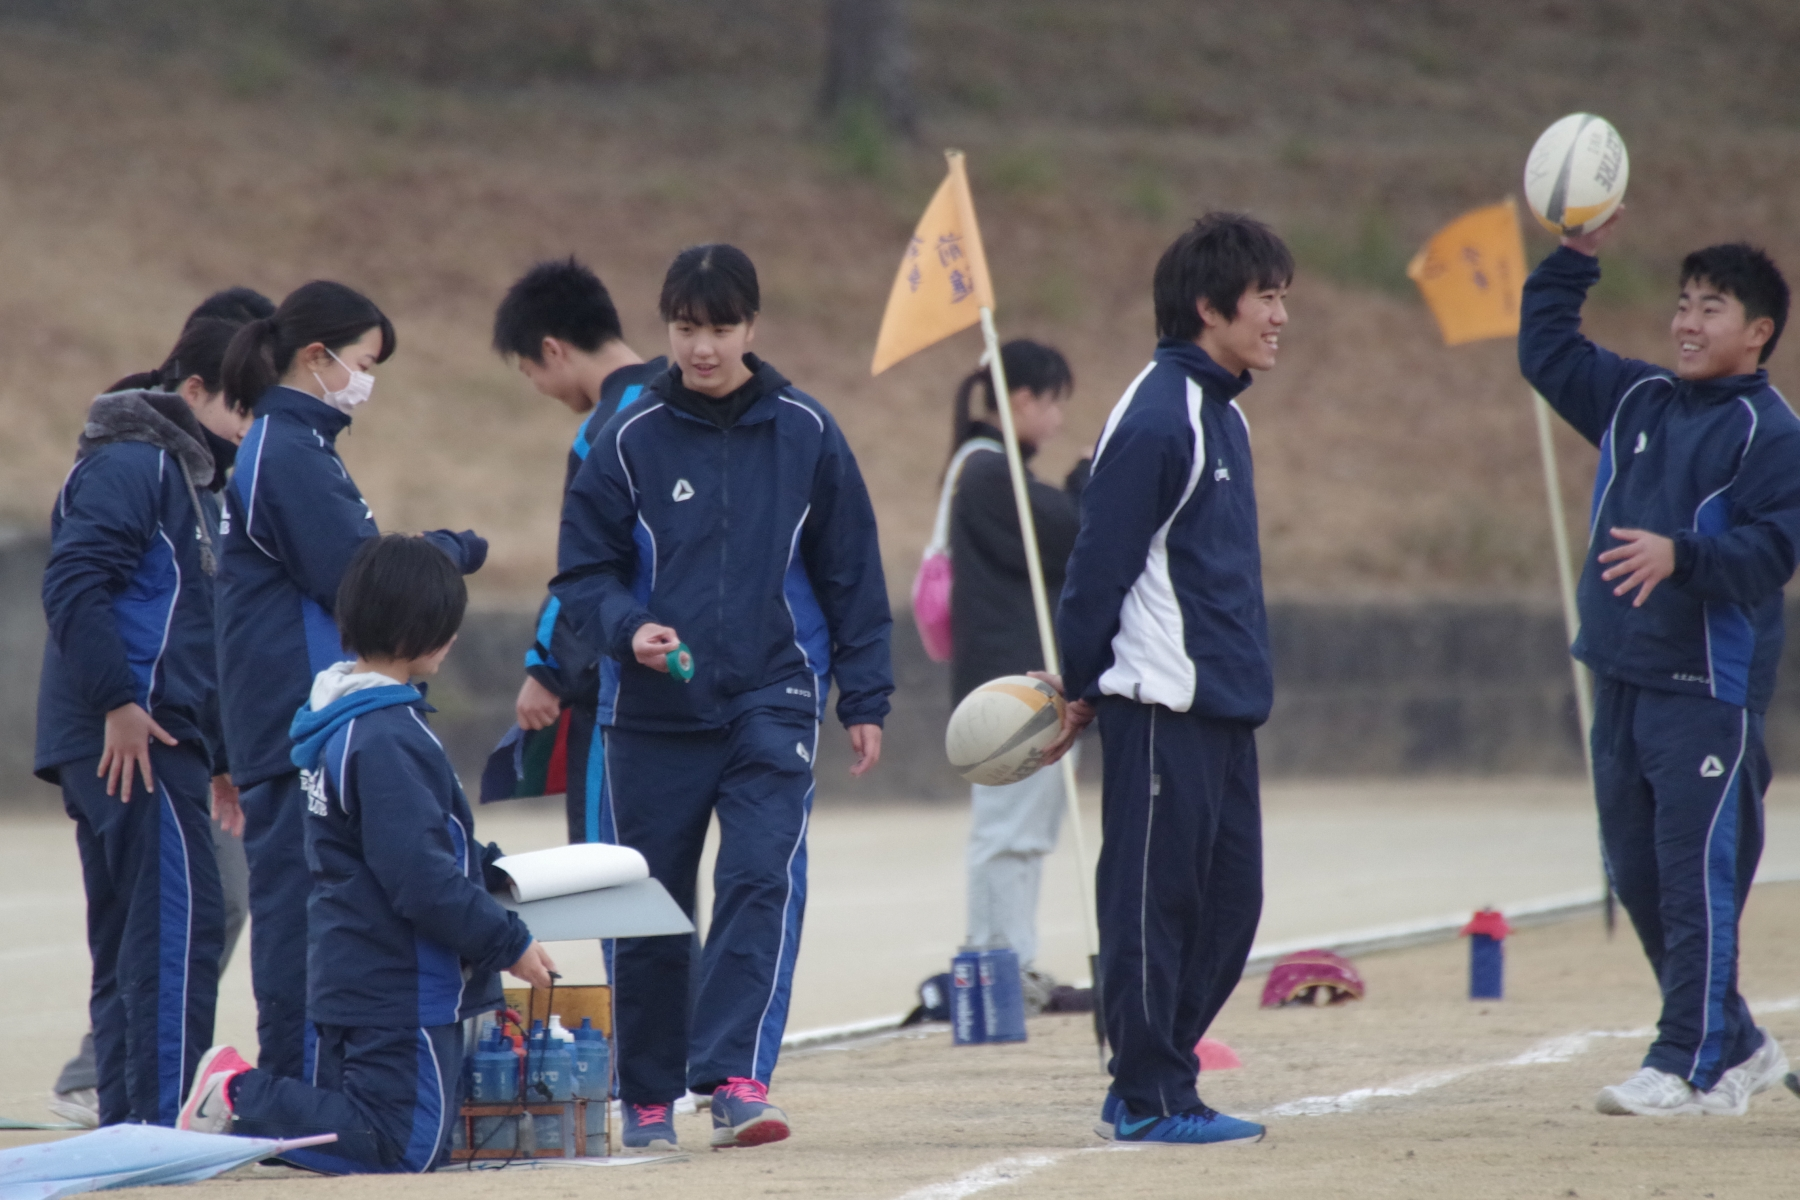 http://kokura-rugby.sakura.ne.jp/mane.jpg